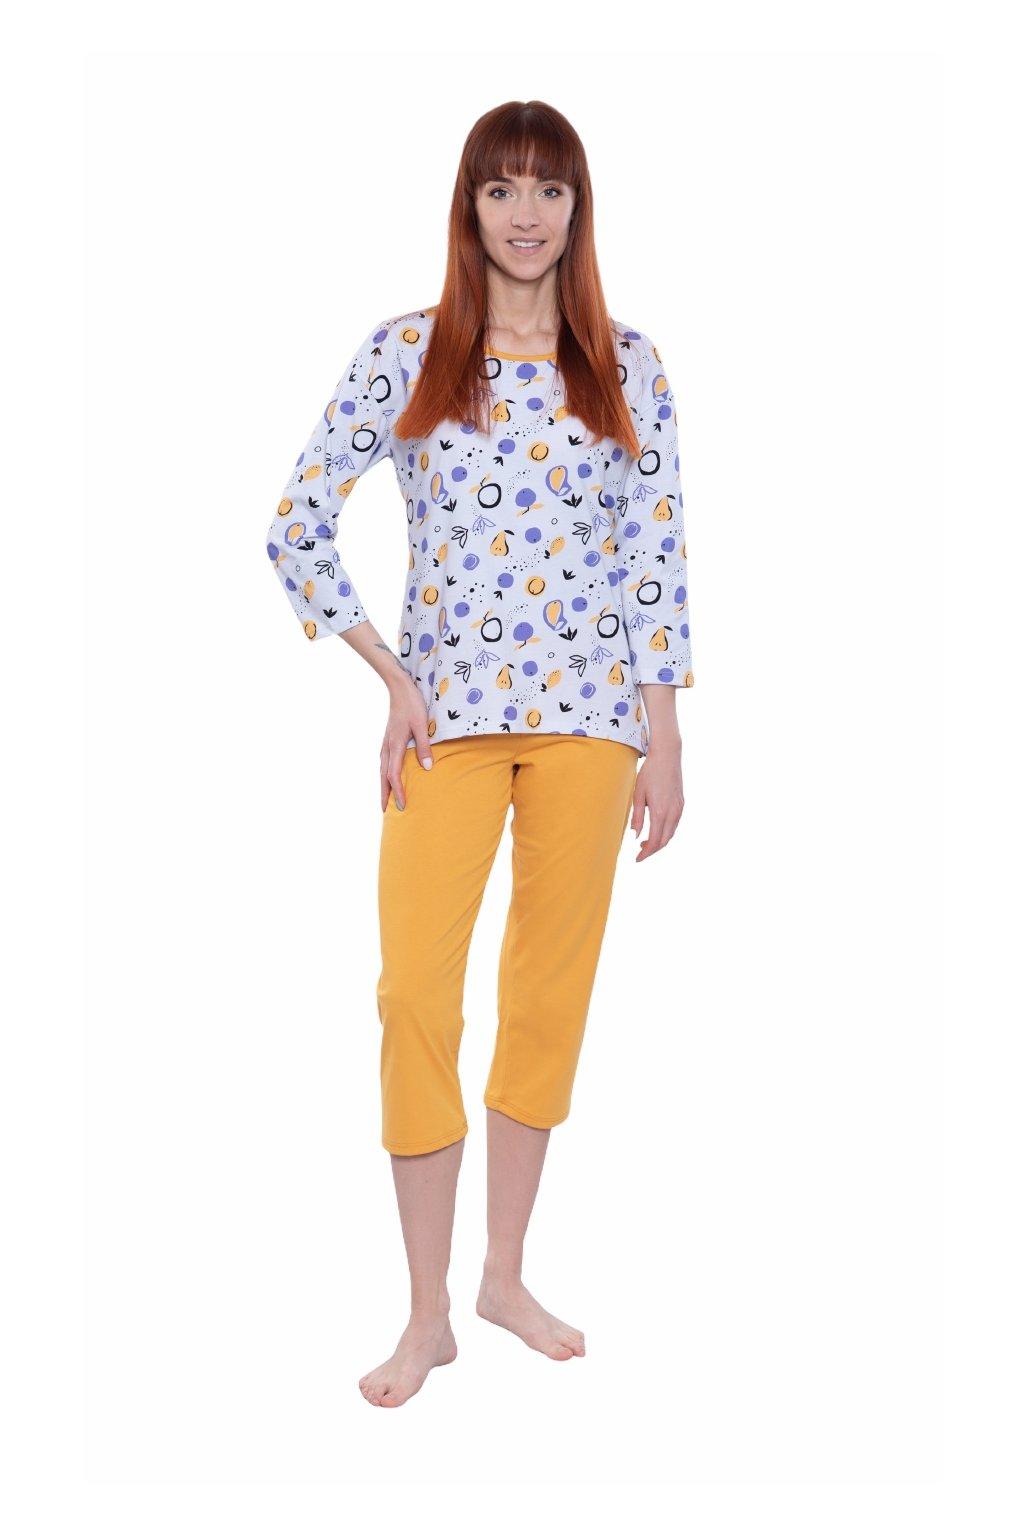 Dámské pyžamo s 3/4 rukávem, 104586 272, žlutá